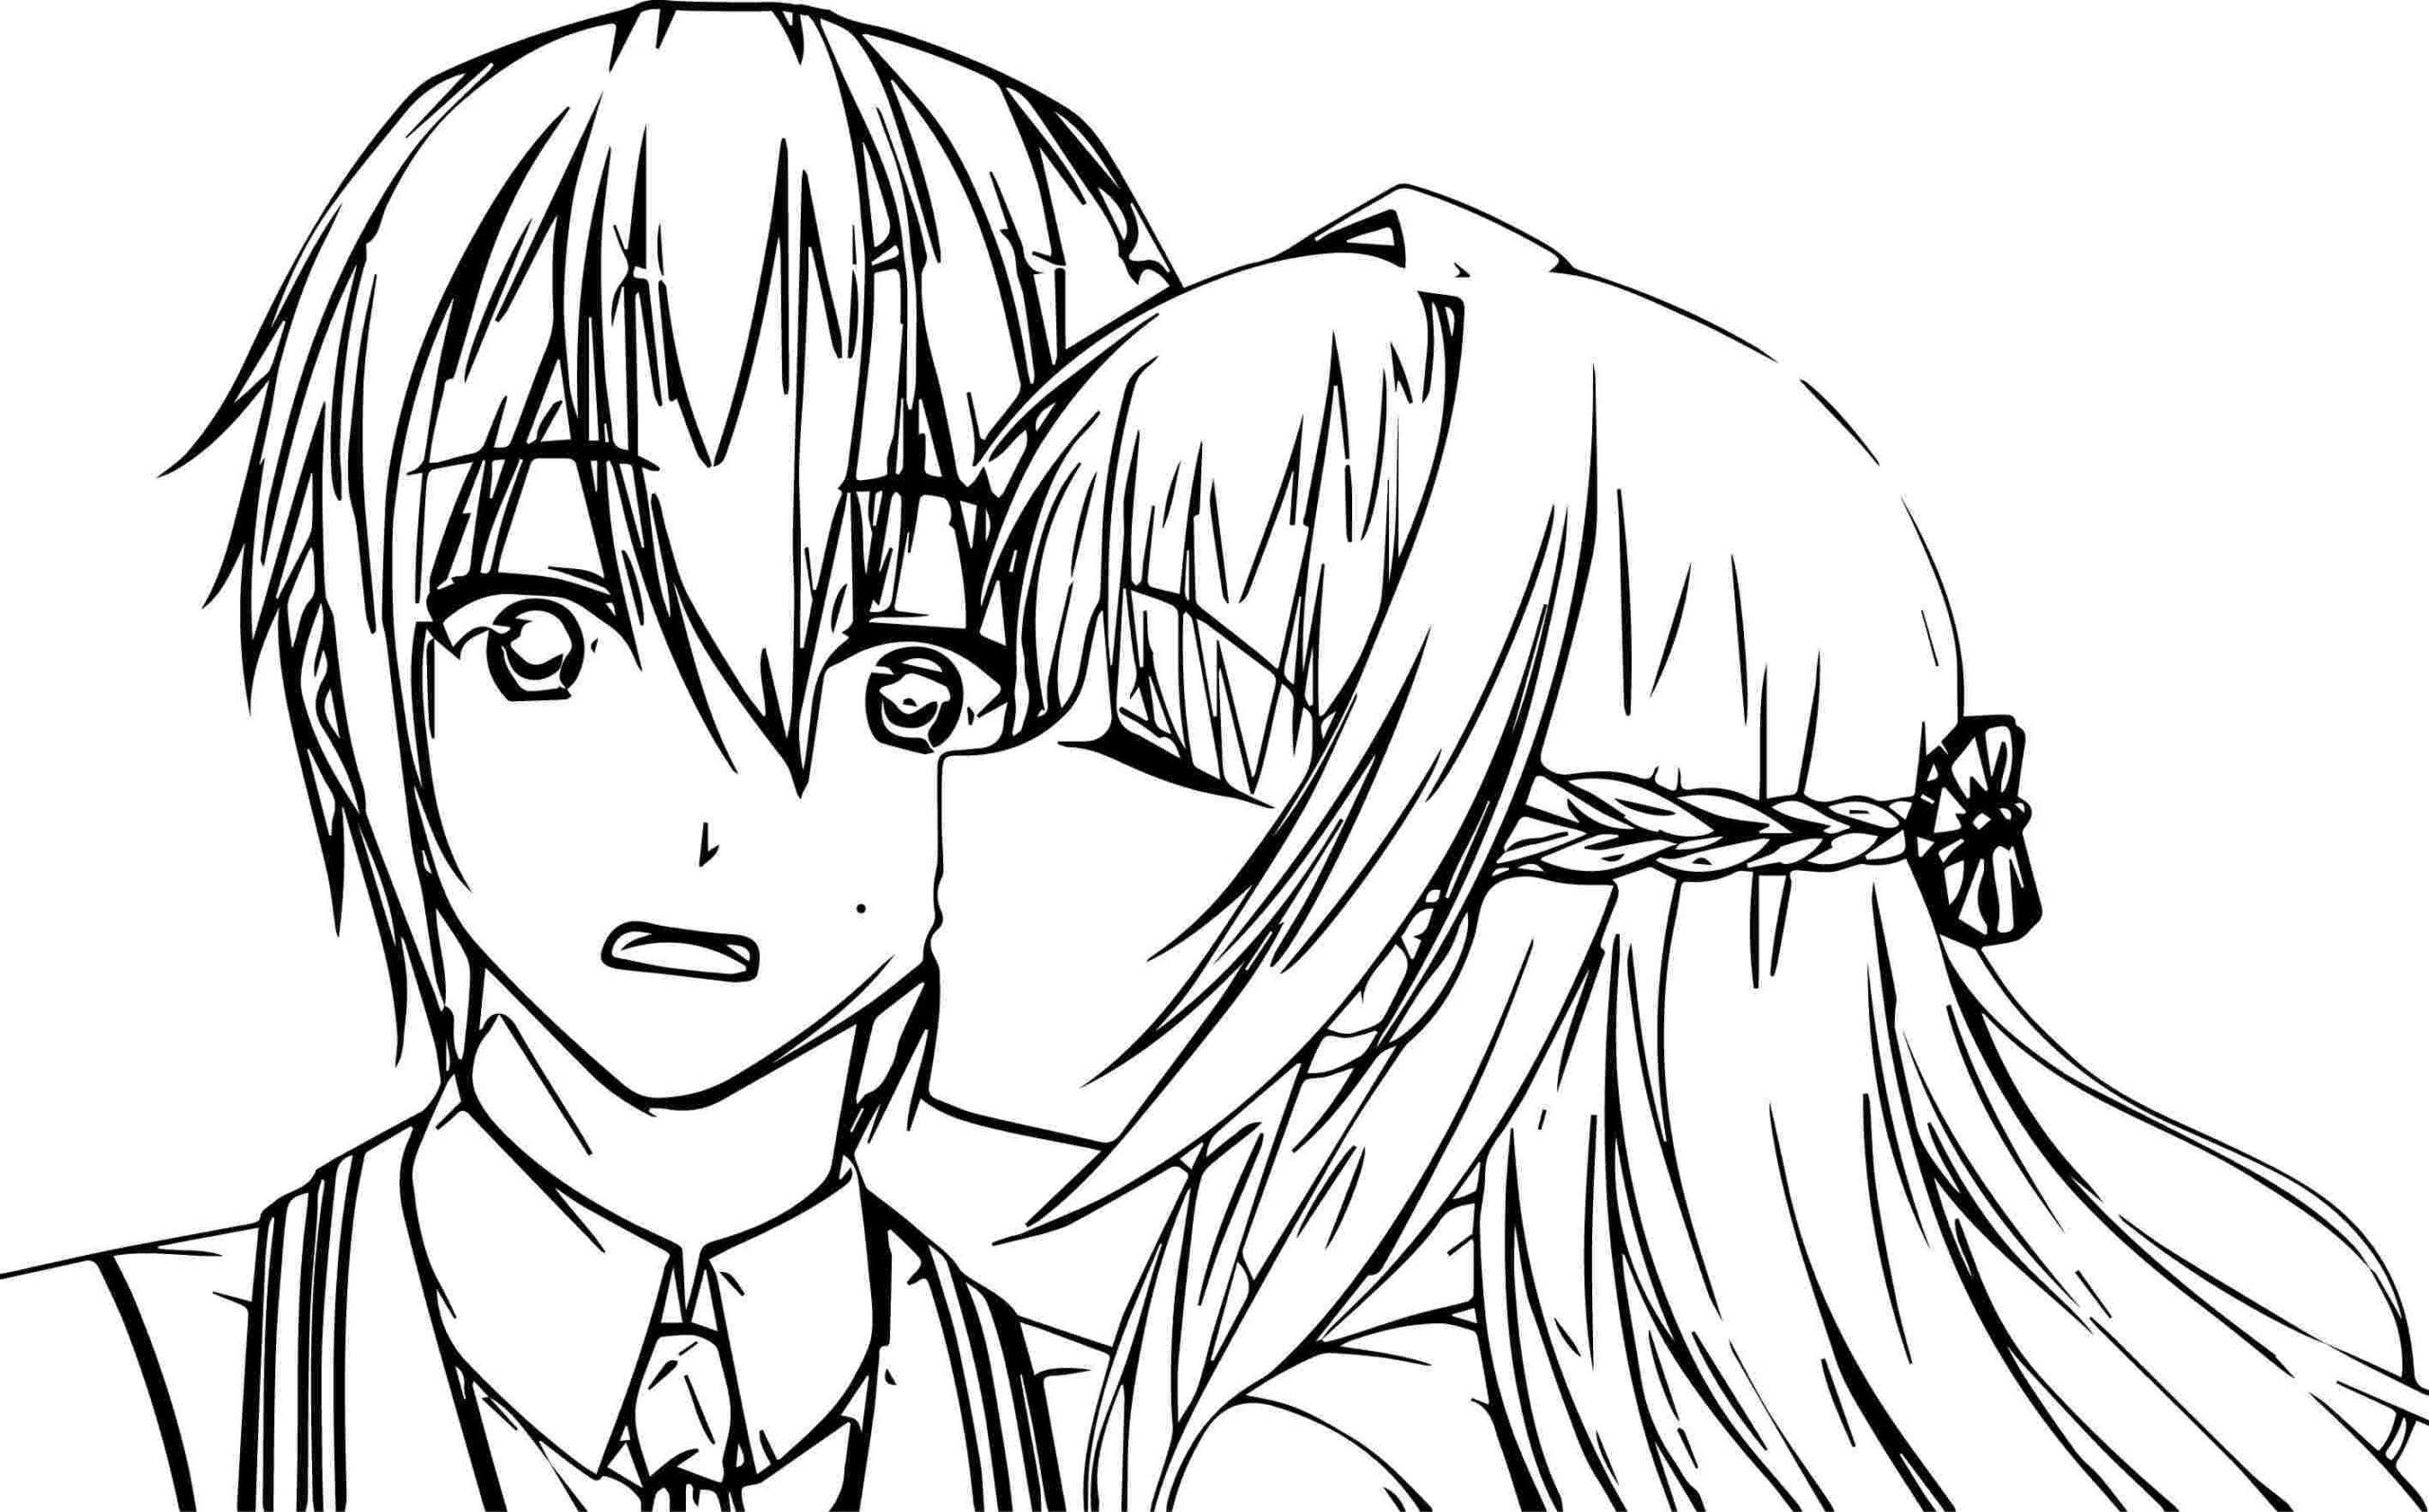 Anime Boy And Girl Coloring Pages - 10x10 Wallpaper - teahub.io